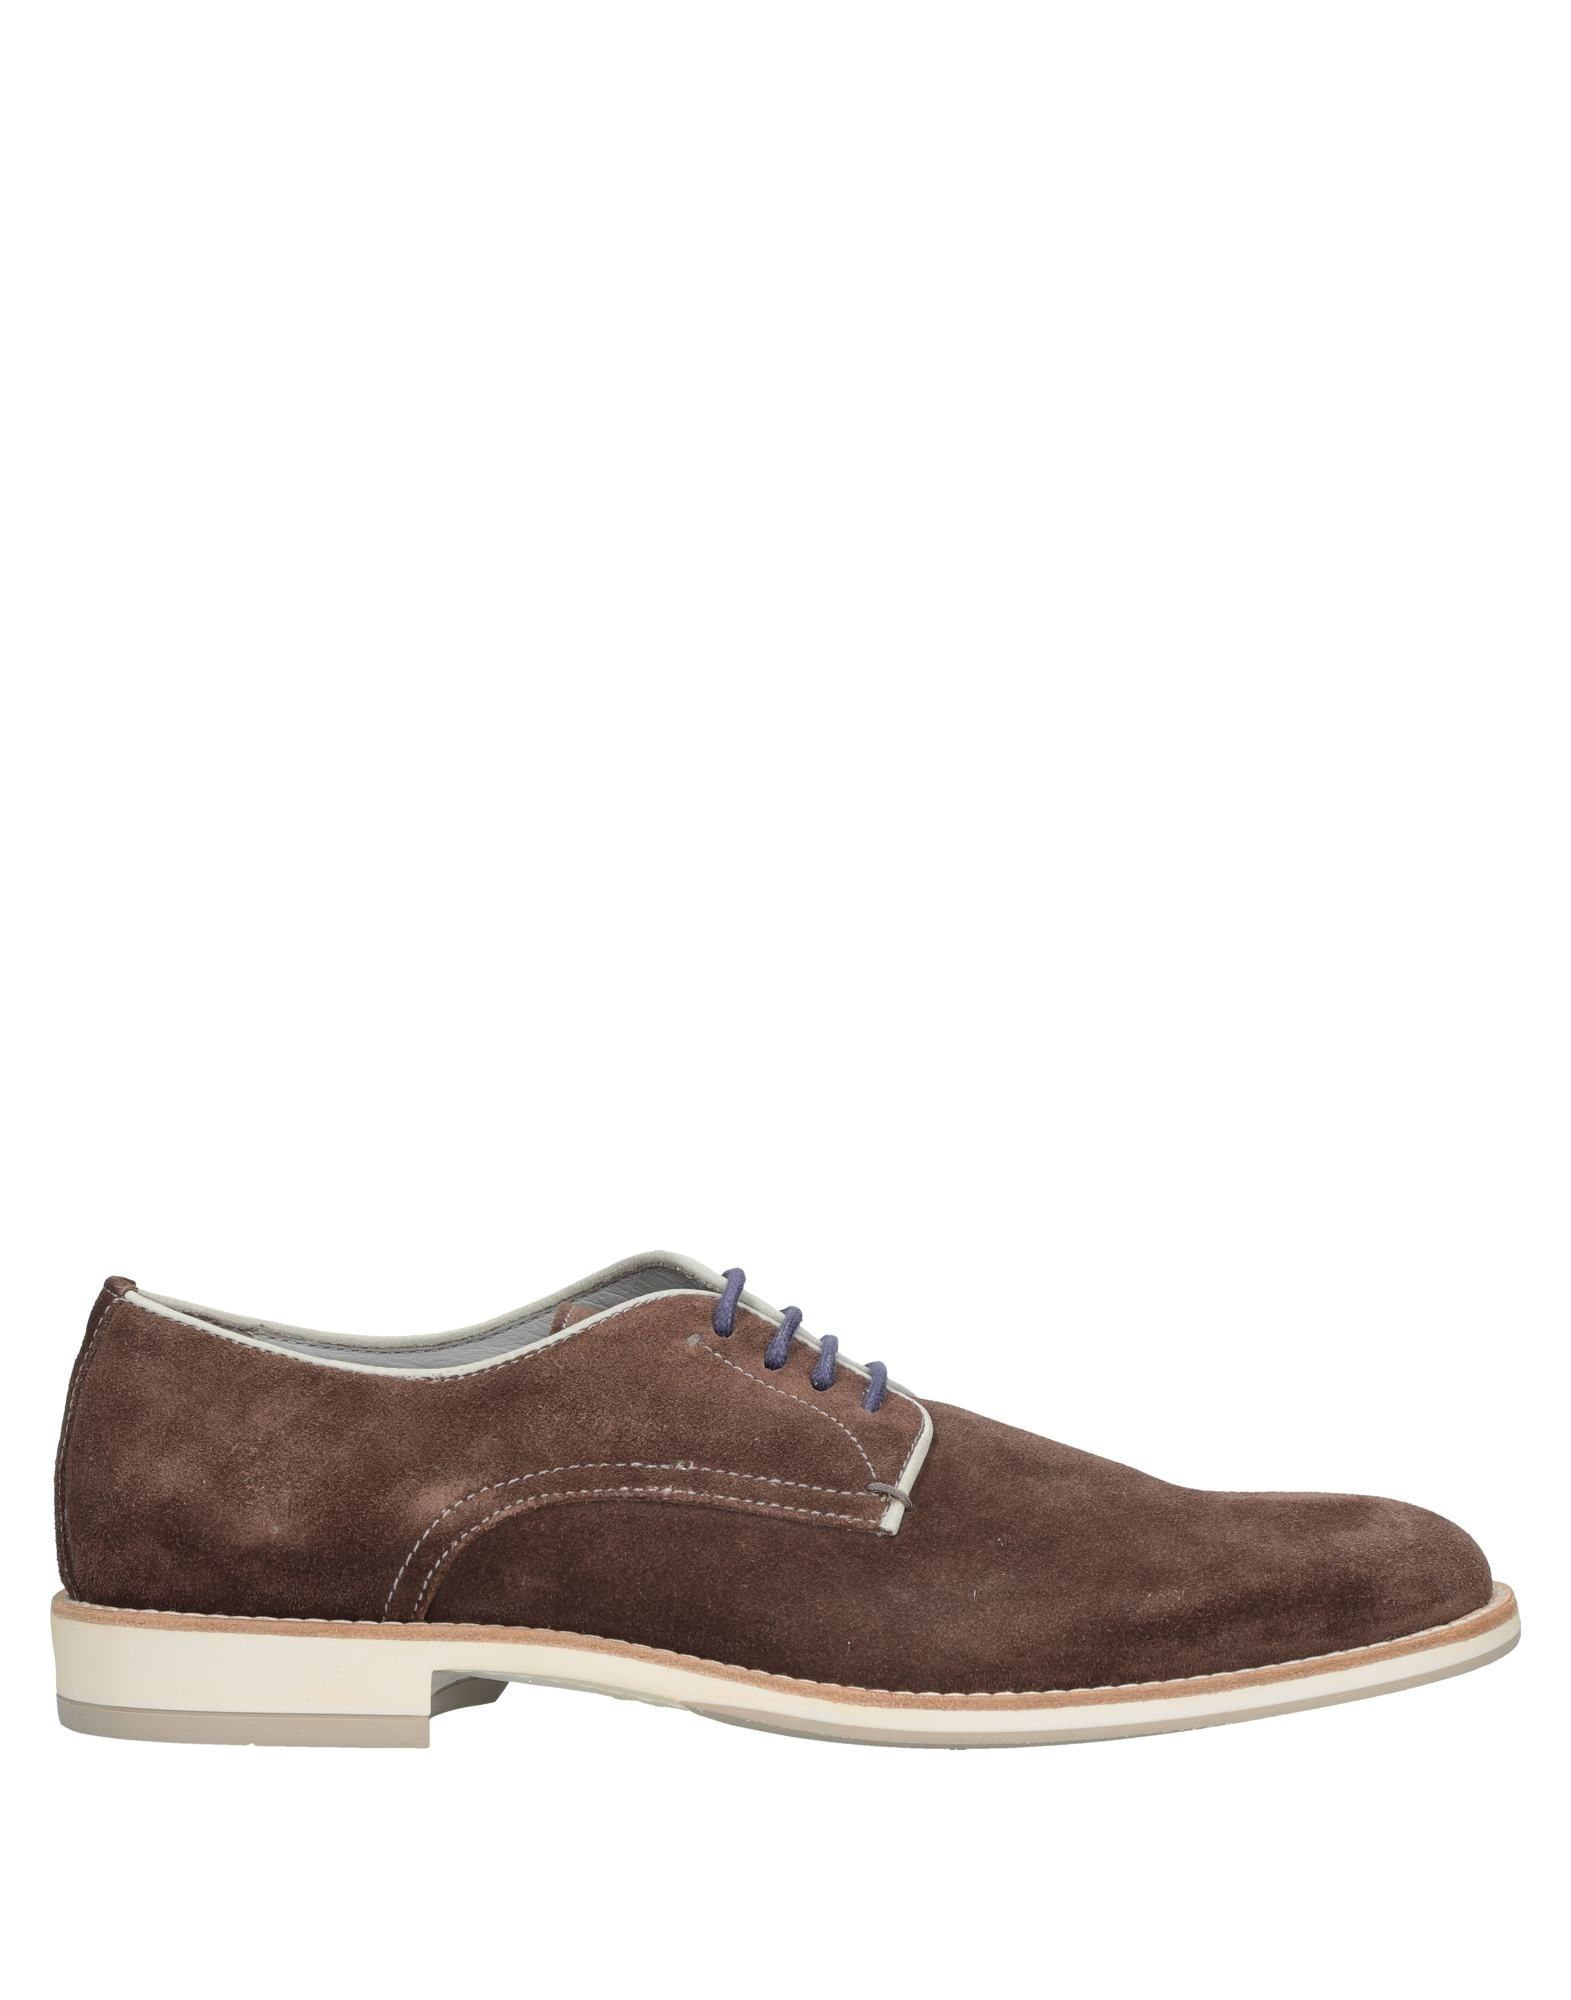 Pal Zileri Schnürschuhe Herren  11526512NC Gute Qualität beliebte Schuhe